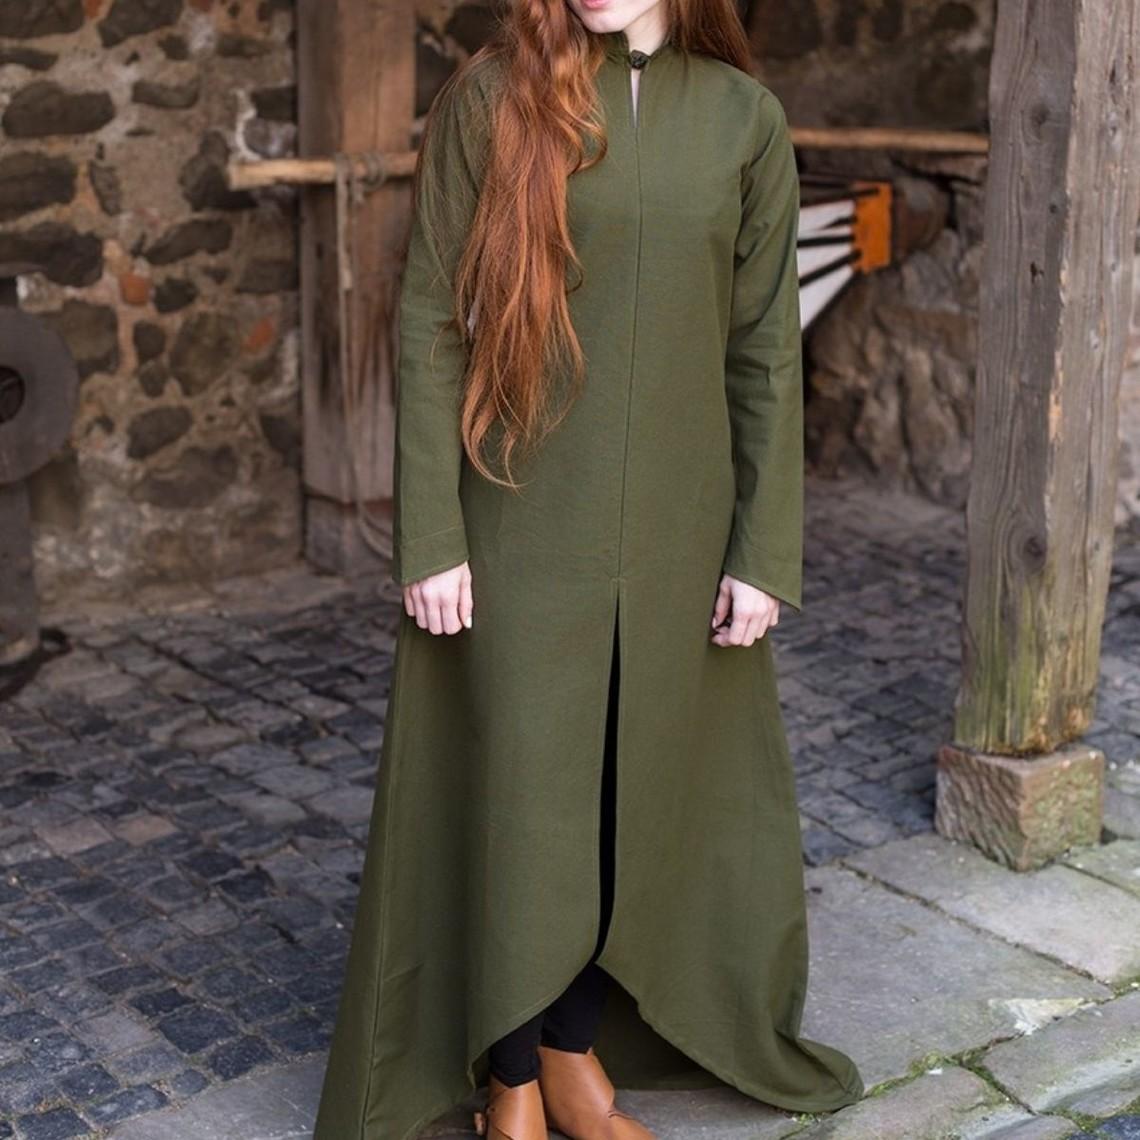 Burgschneider Vestido Ranwen, verde oliva